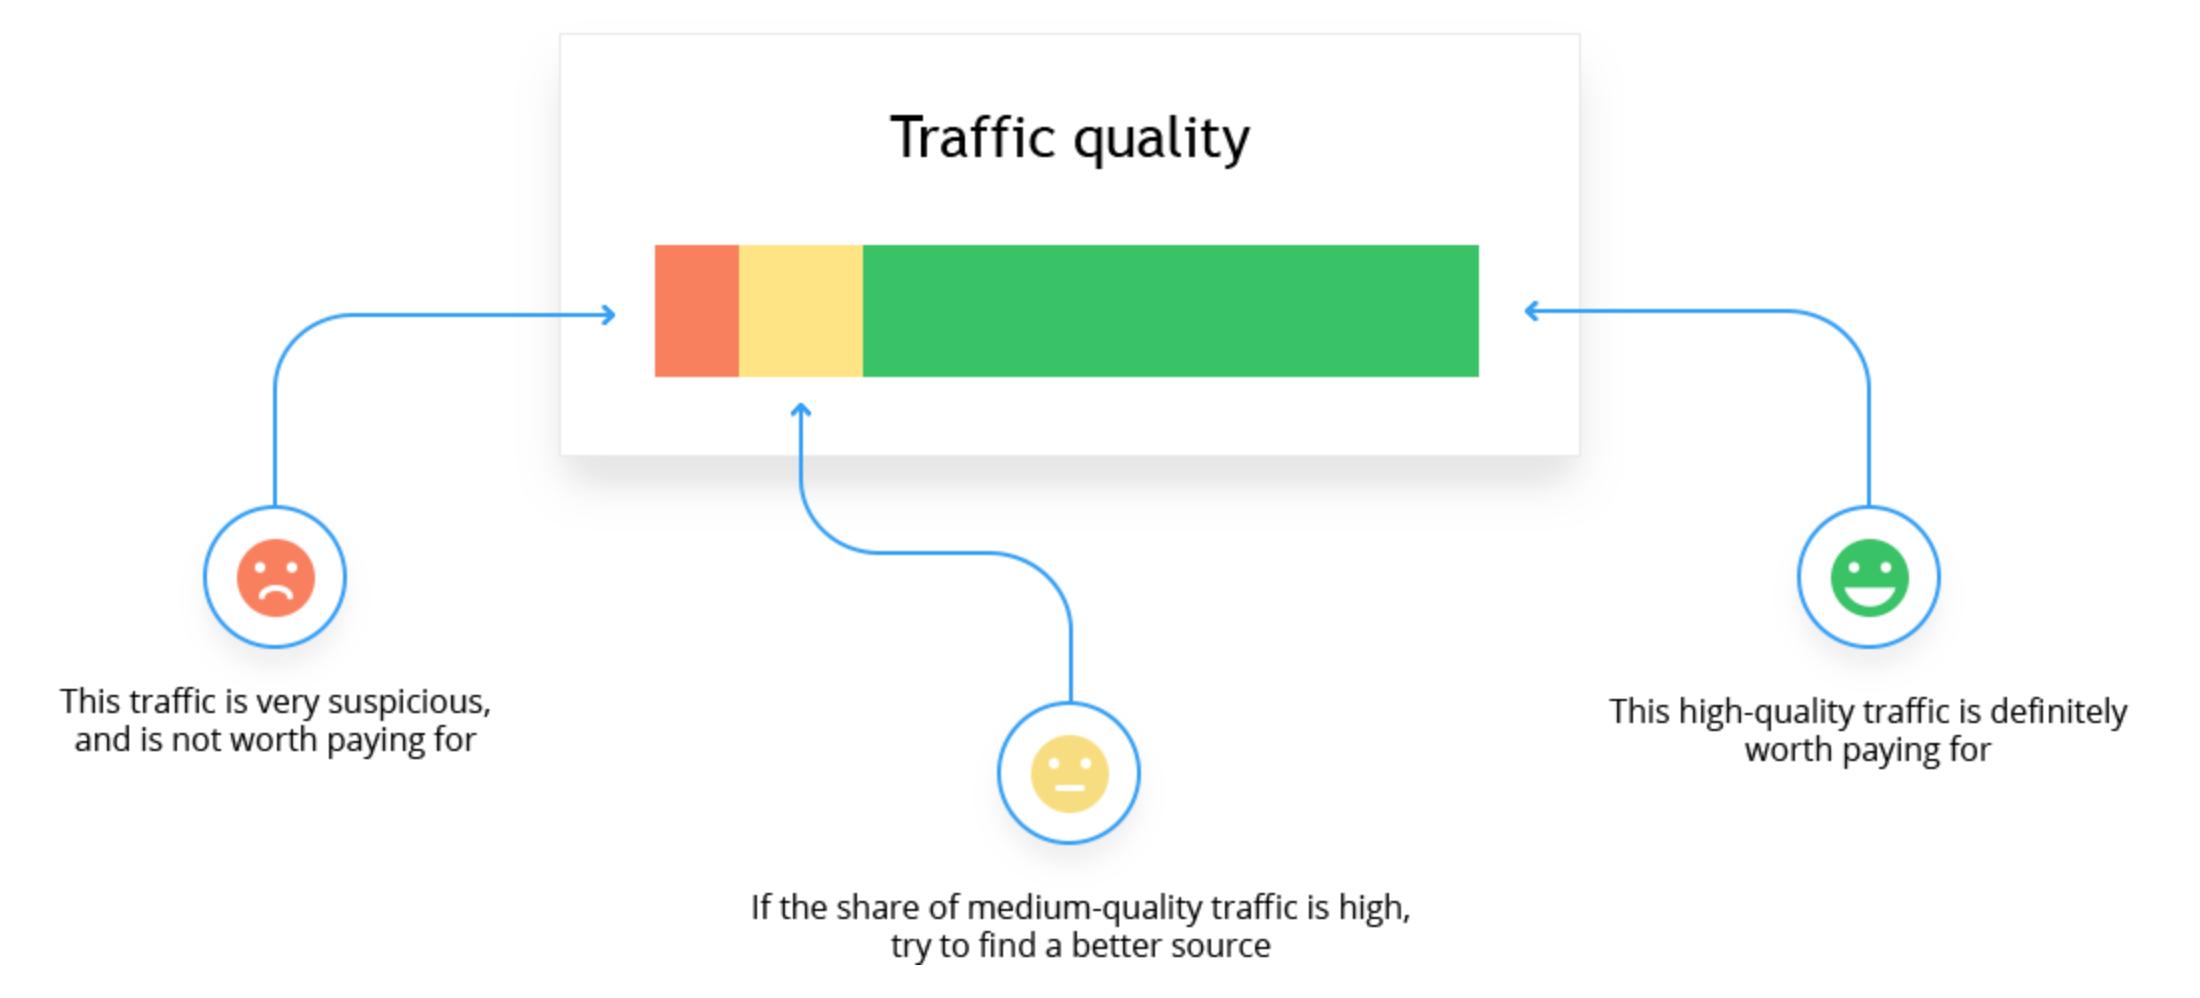 Finteza traffic quality